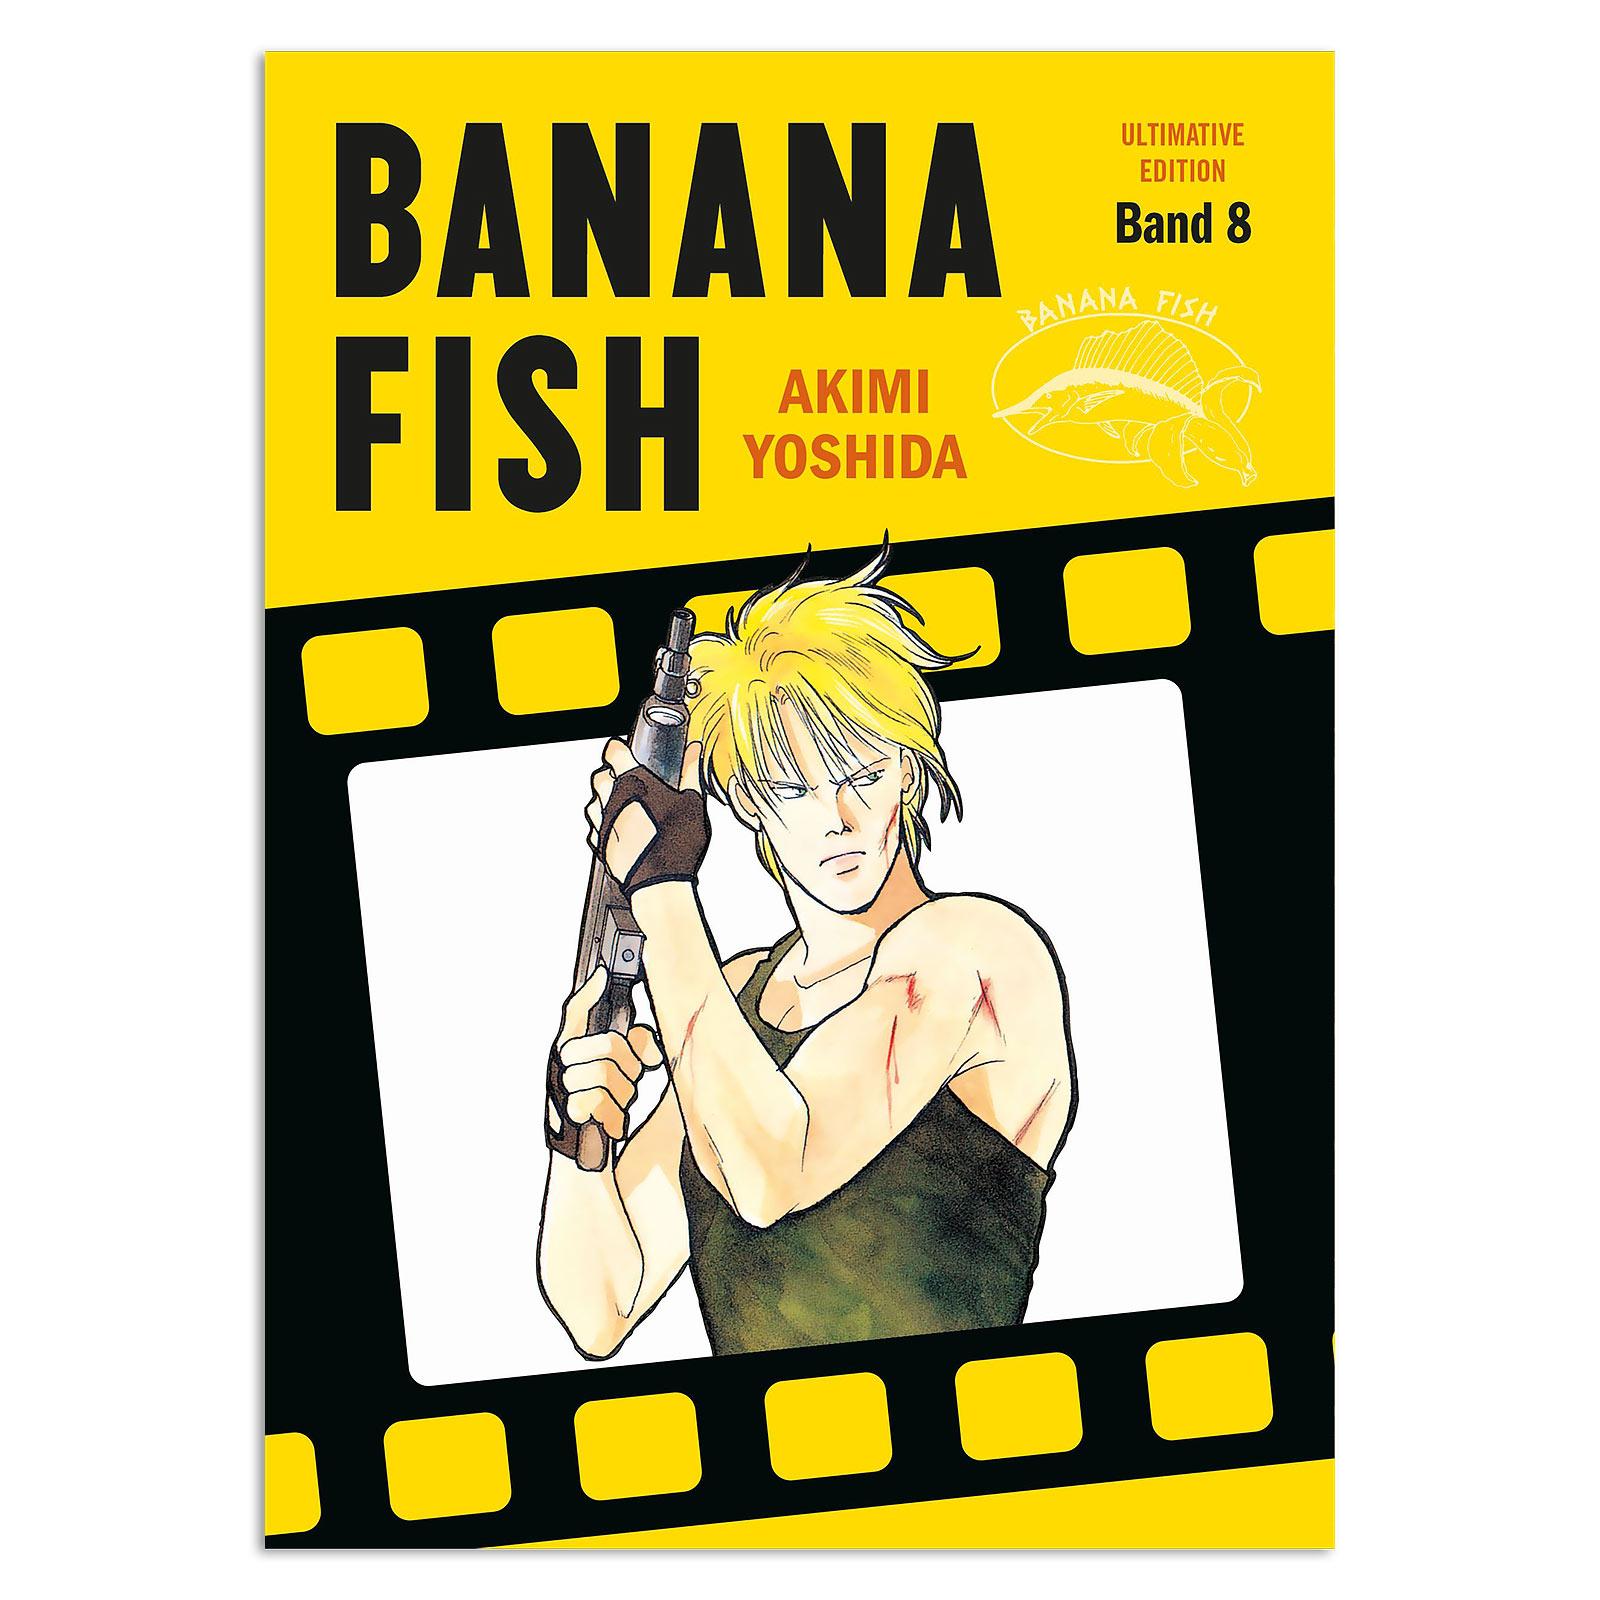 Banana Fish - Band 8 Taschenbuch Ultimate Edition